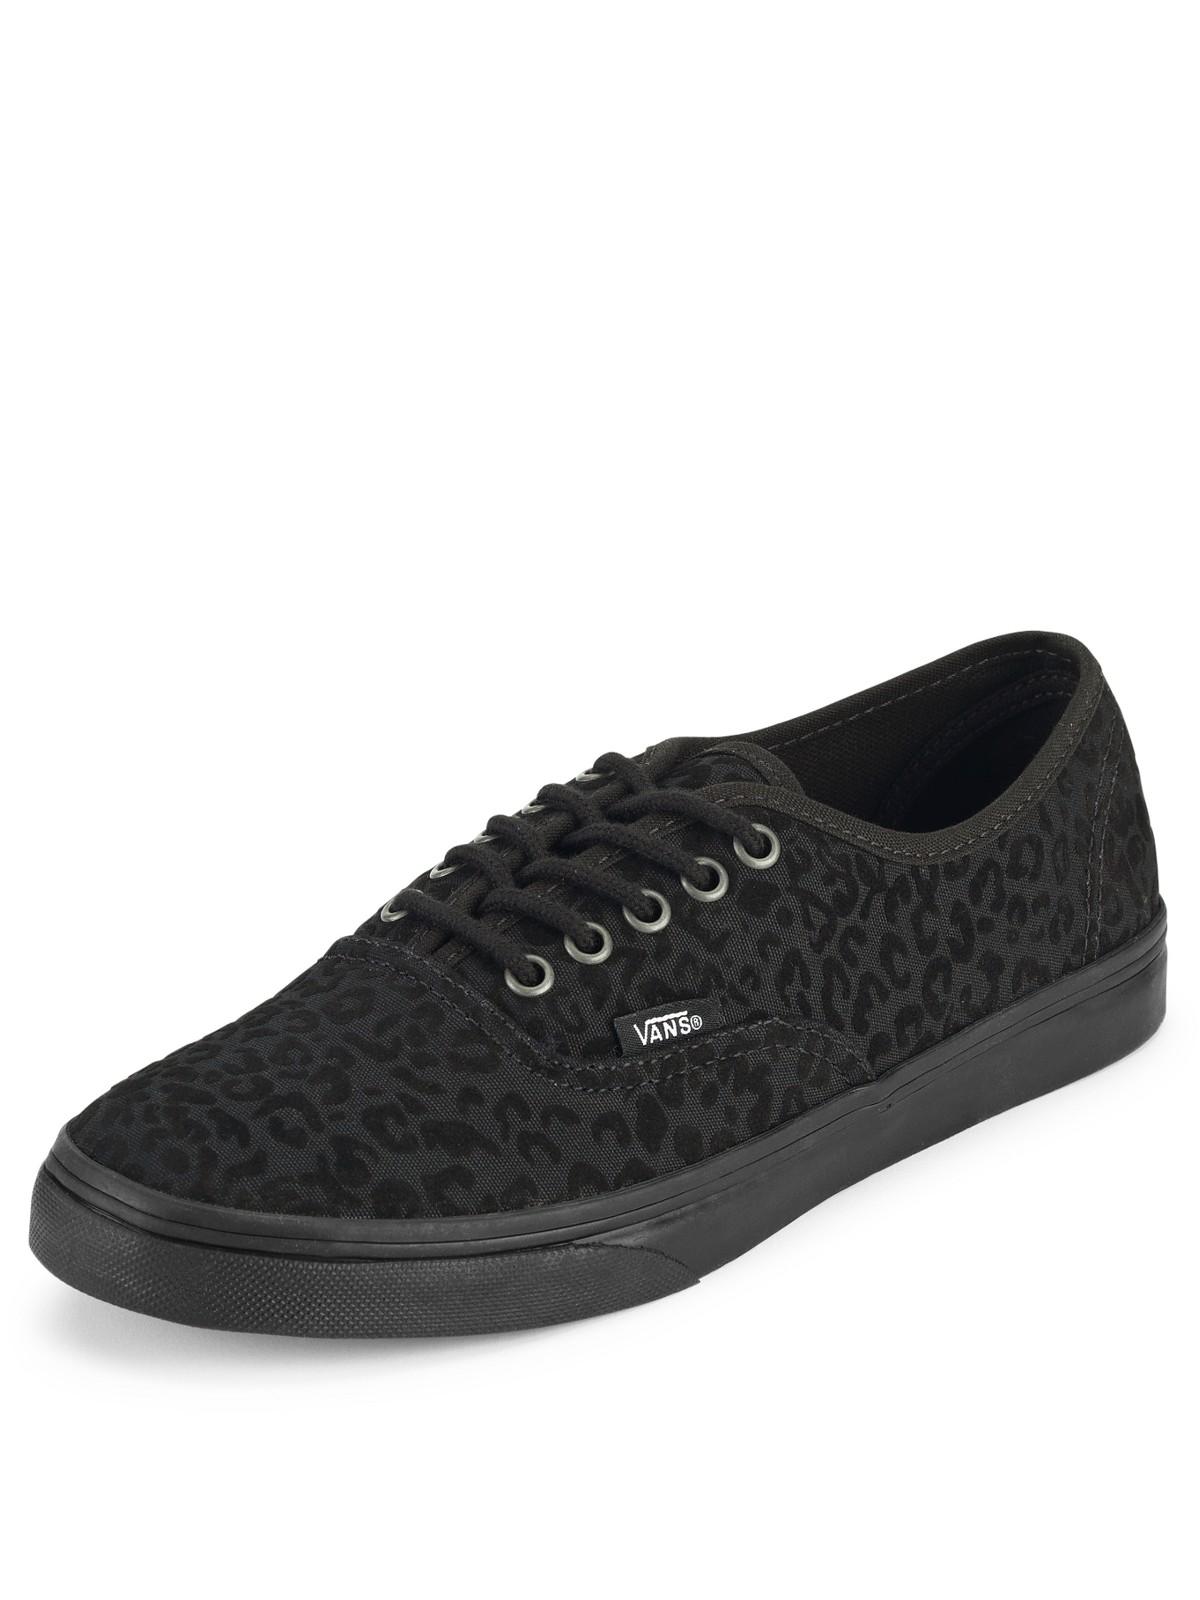 lo pro vans black cheetah